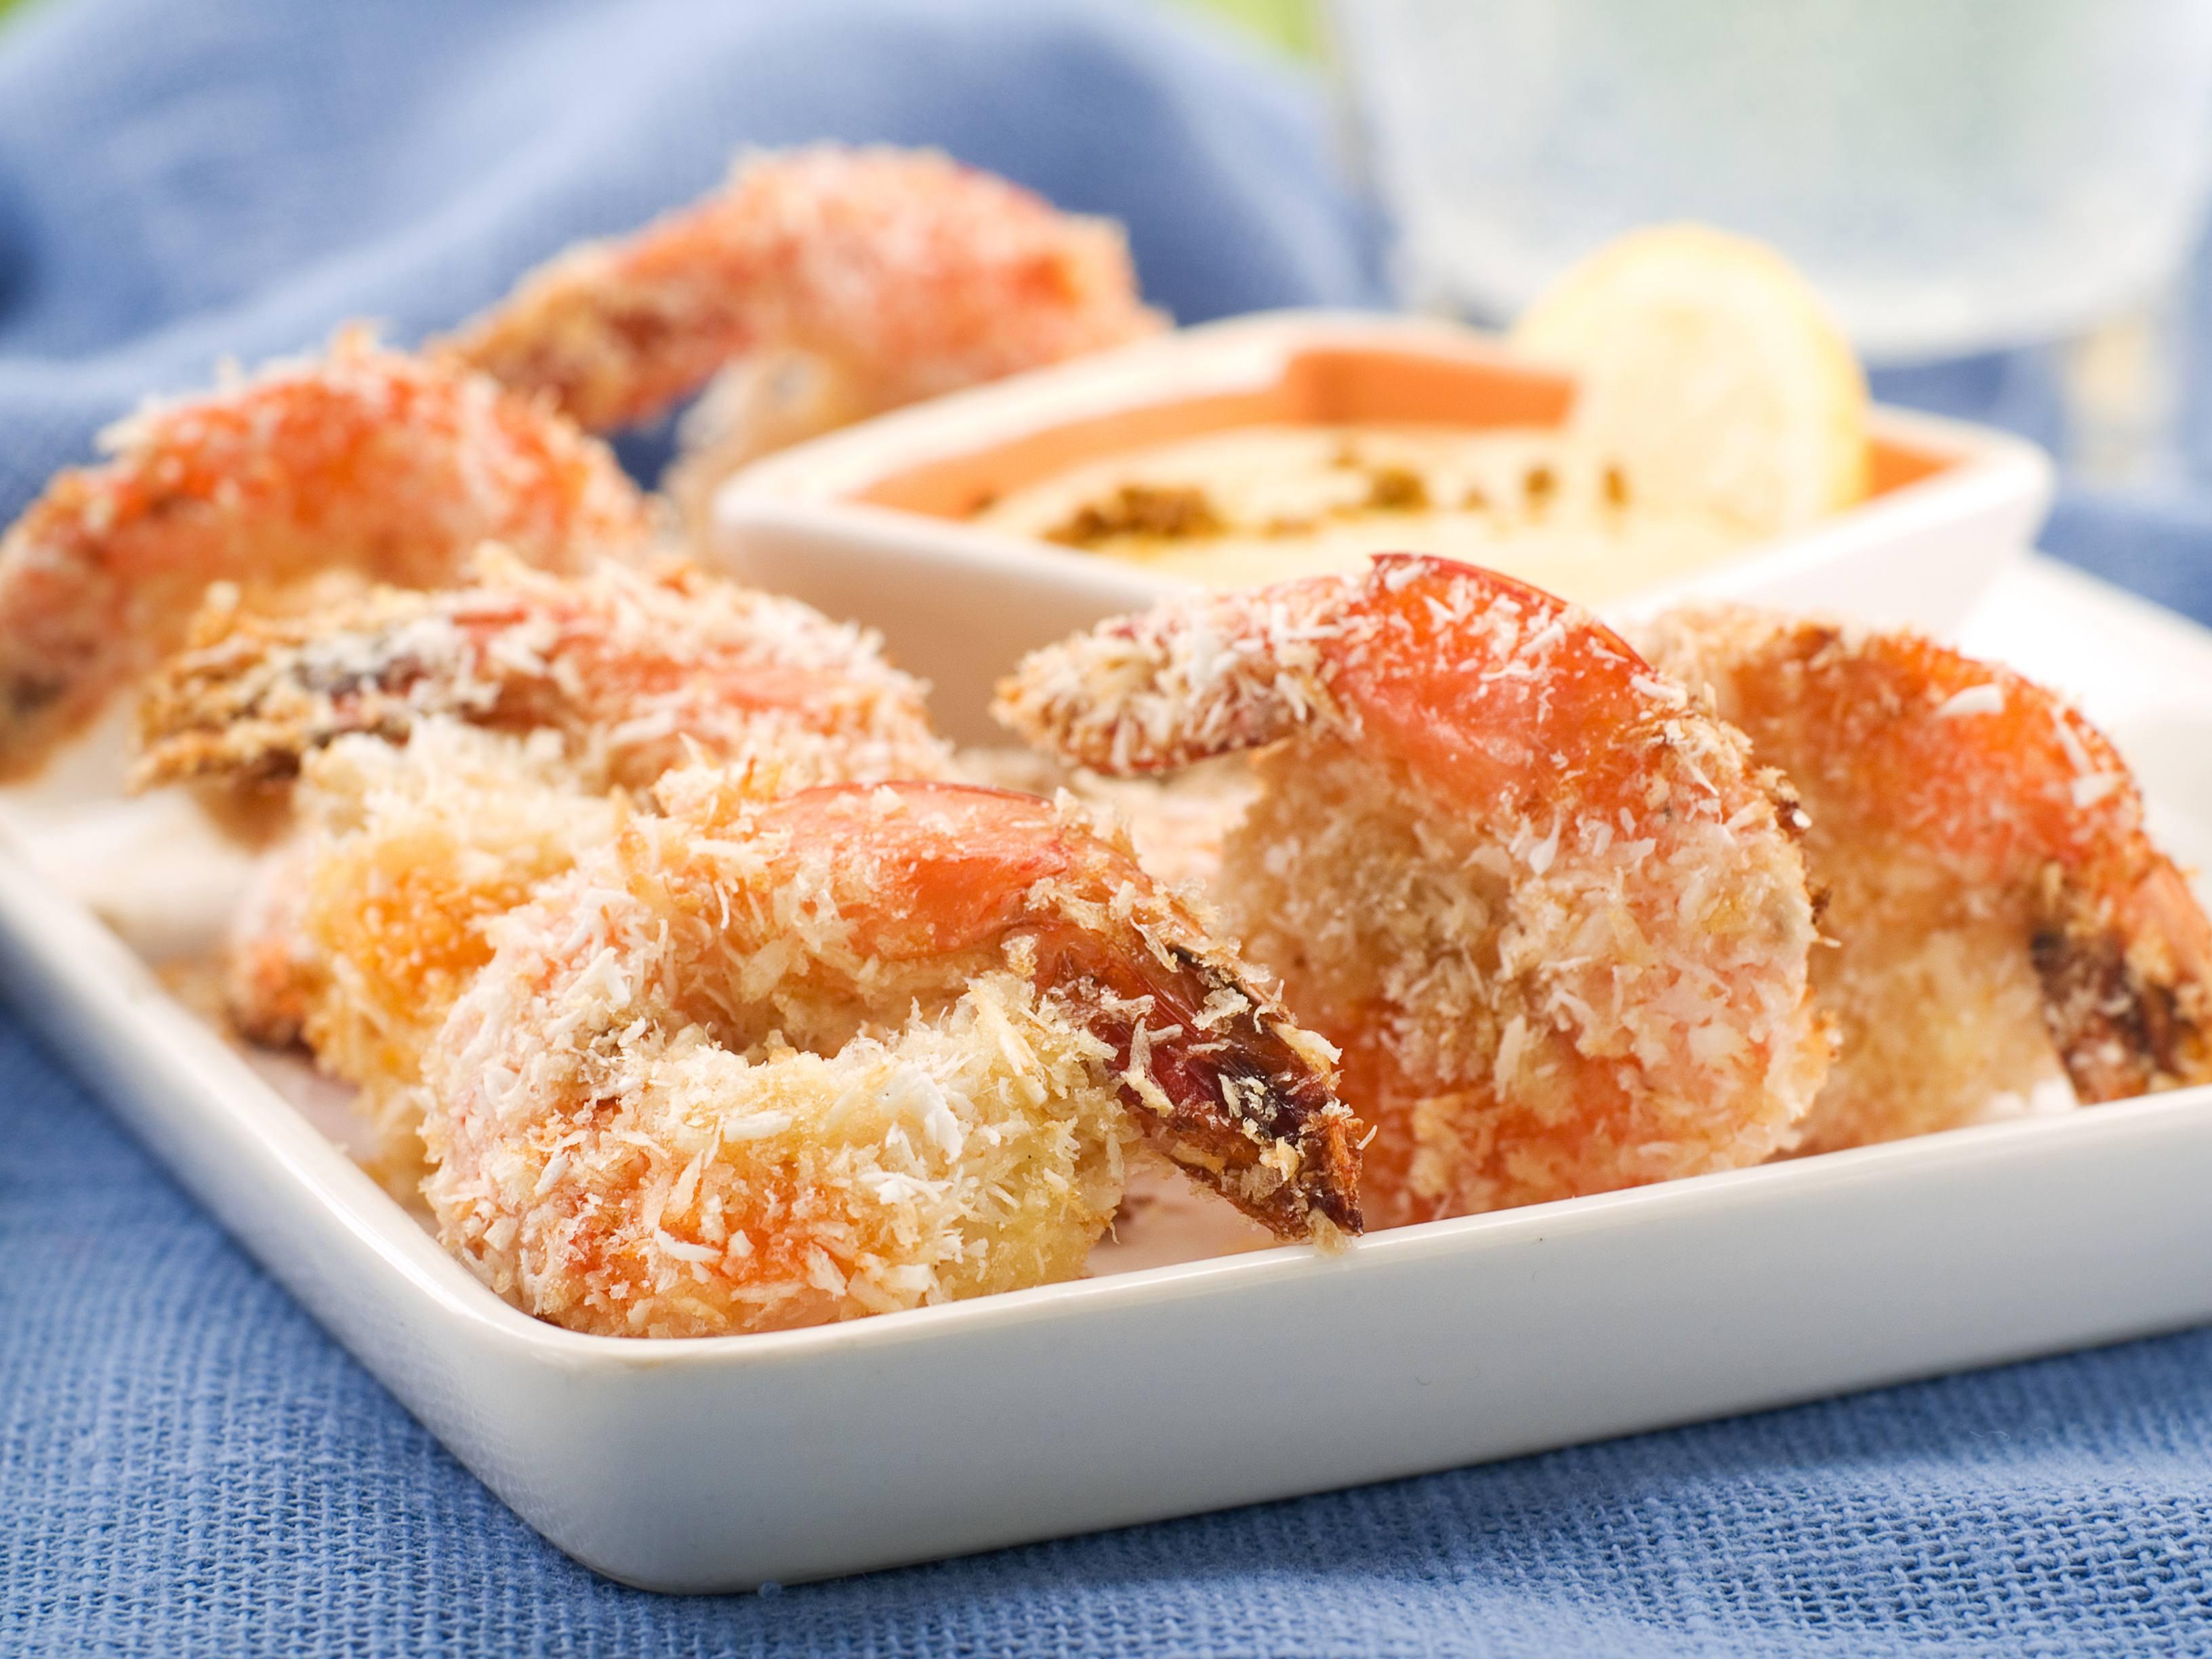 Making Mayo's Recipes: Baking coconut shrimp